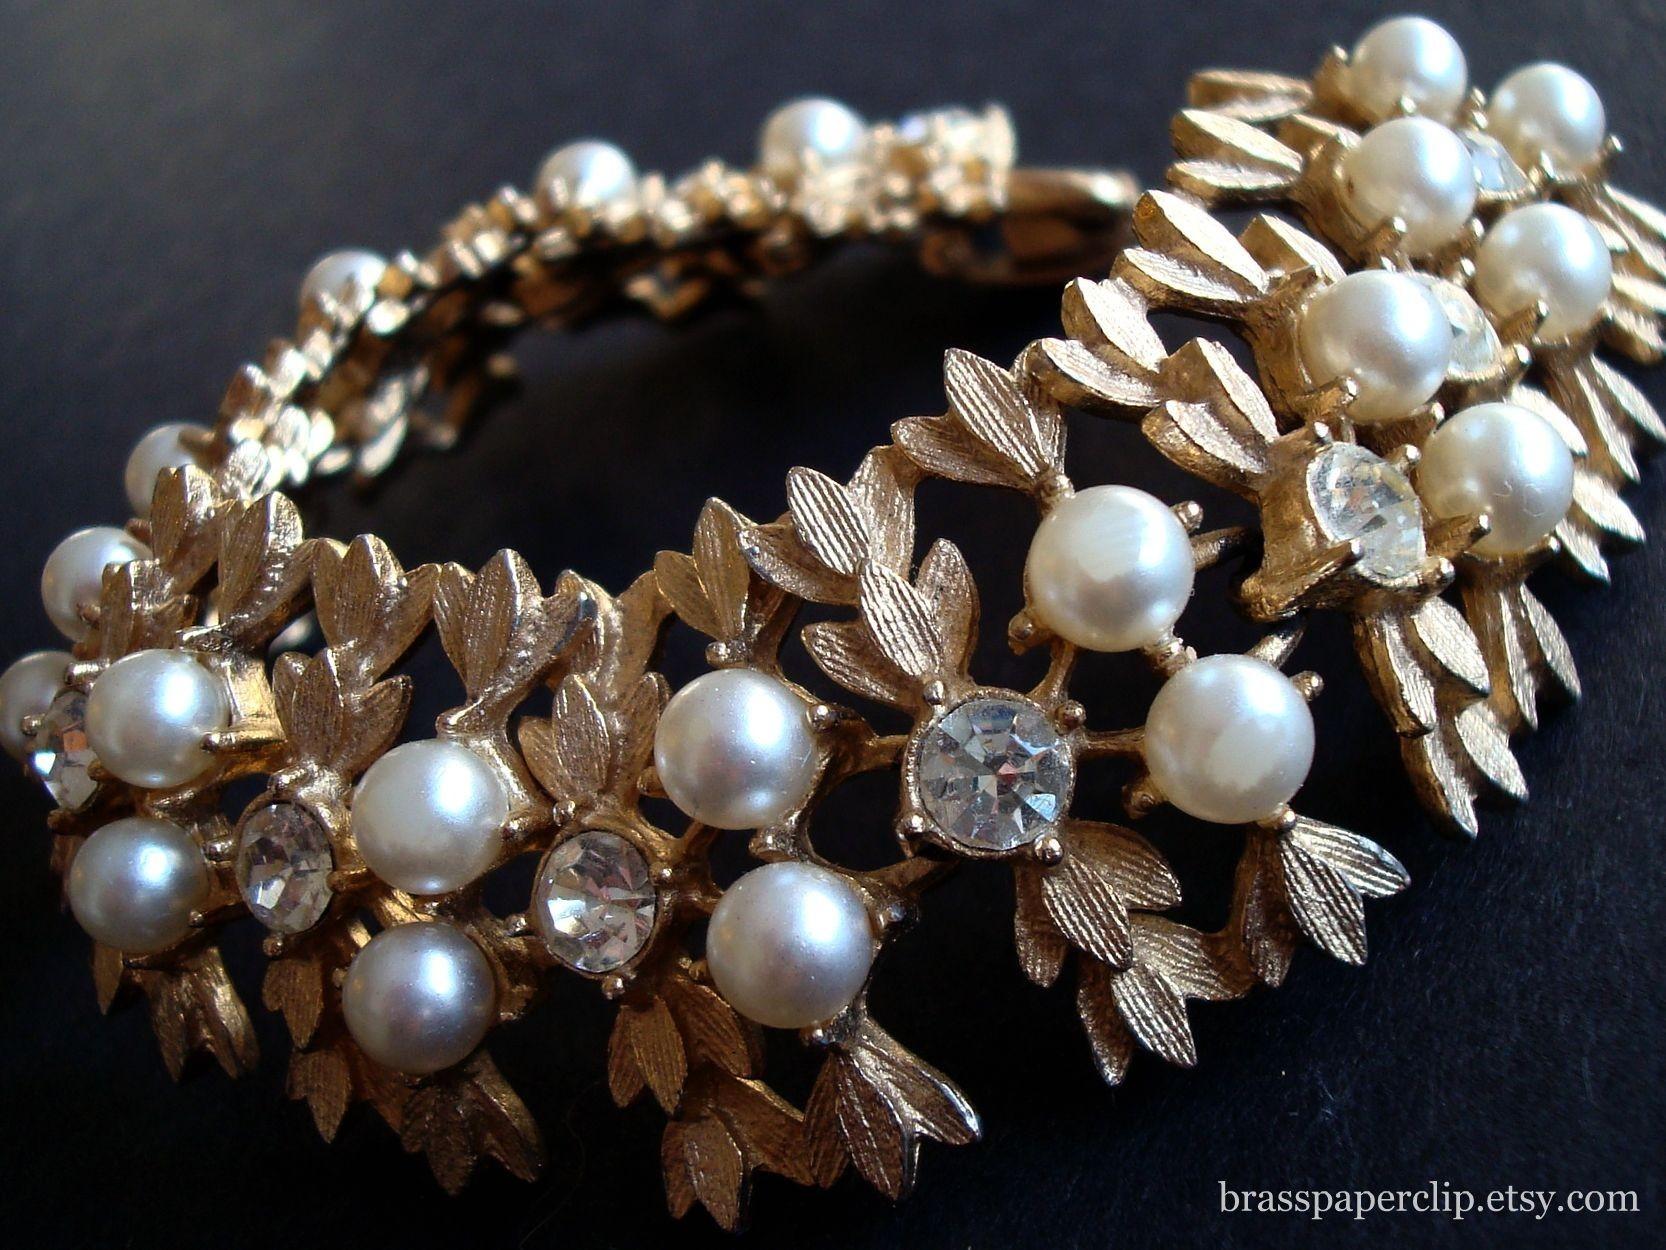 Jewelry, Bracelets, Vintage, Bracelet, Rhinestone, Pearl, Sarah, Brass paperclip, Paperclip, Brass, Coventry